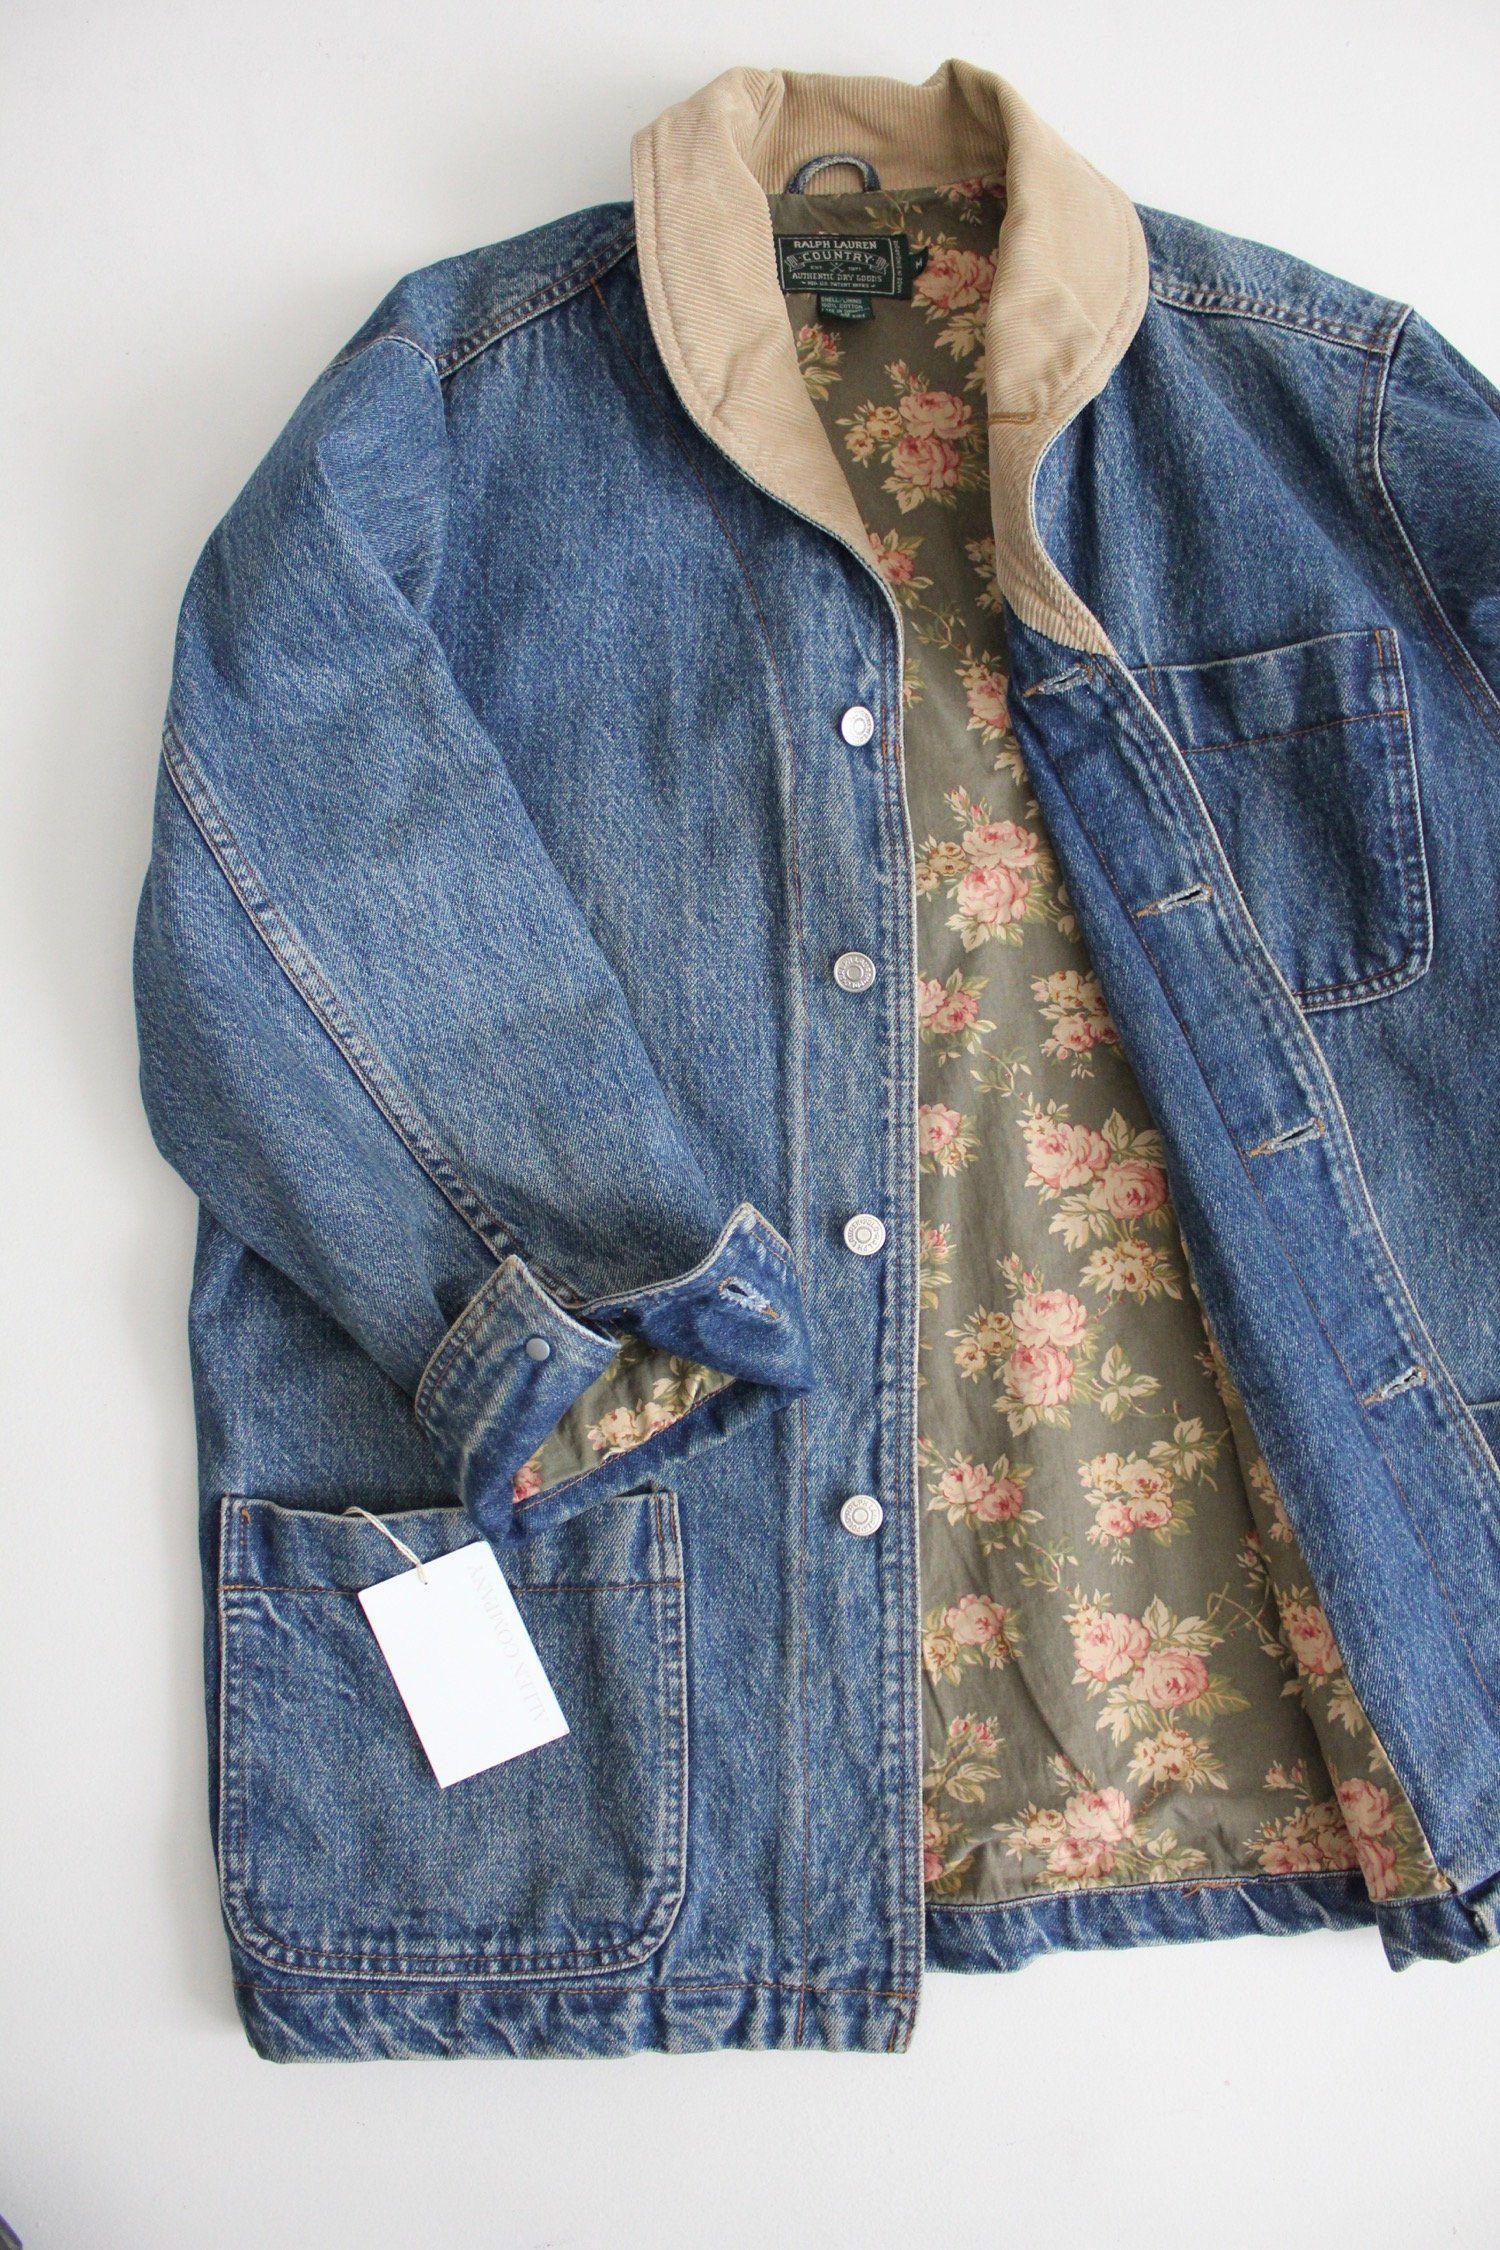 Denim Barn Coat Floral Lined Denim Jacket Ralph Lauren Denim Coat Lined Denim Jacket Denim Jacket Fashion [ 2250 x 1500 Pixel ]